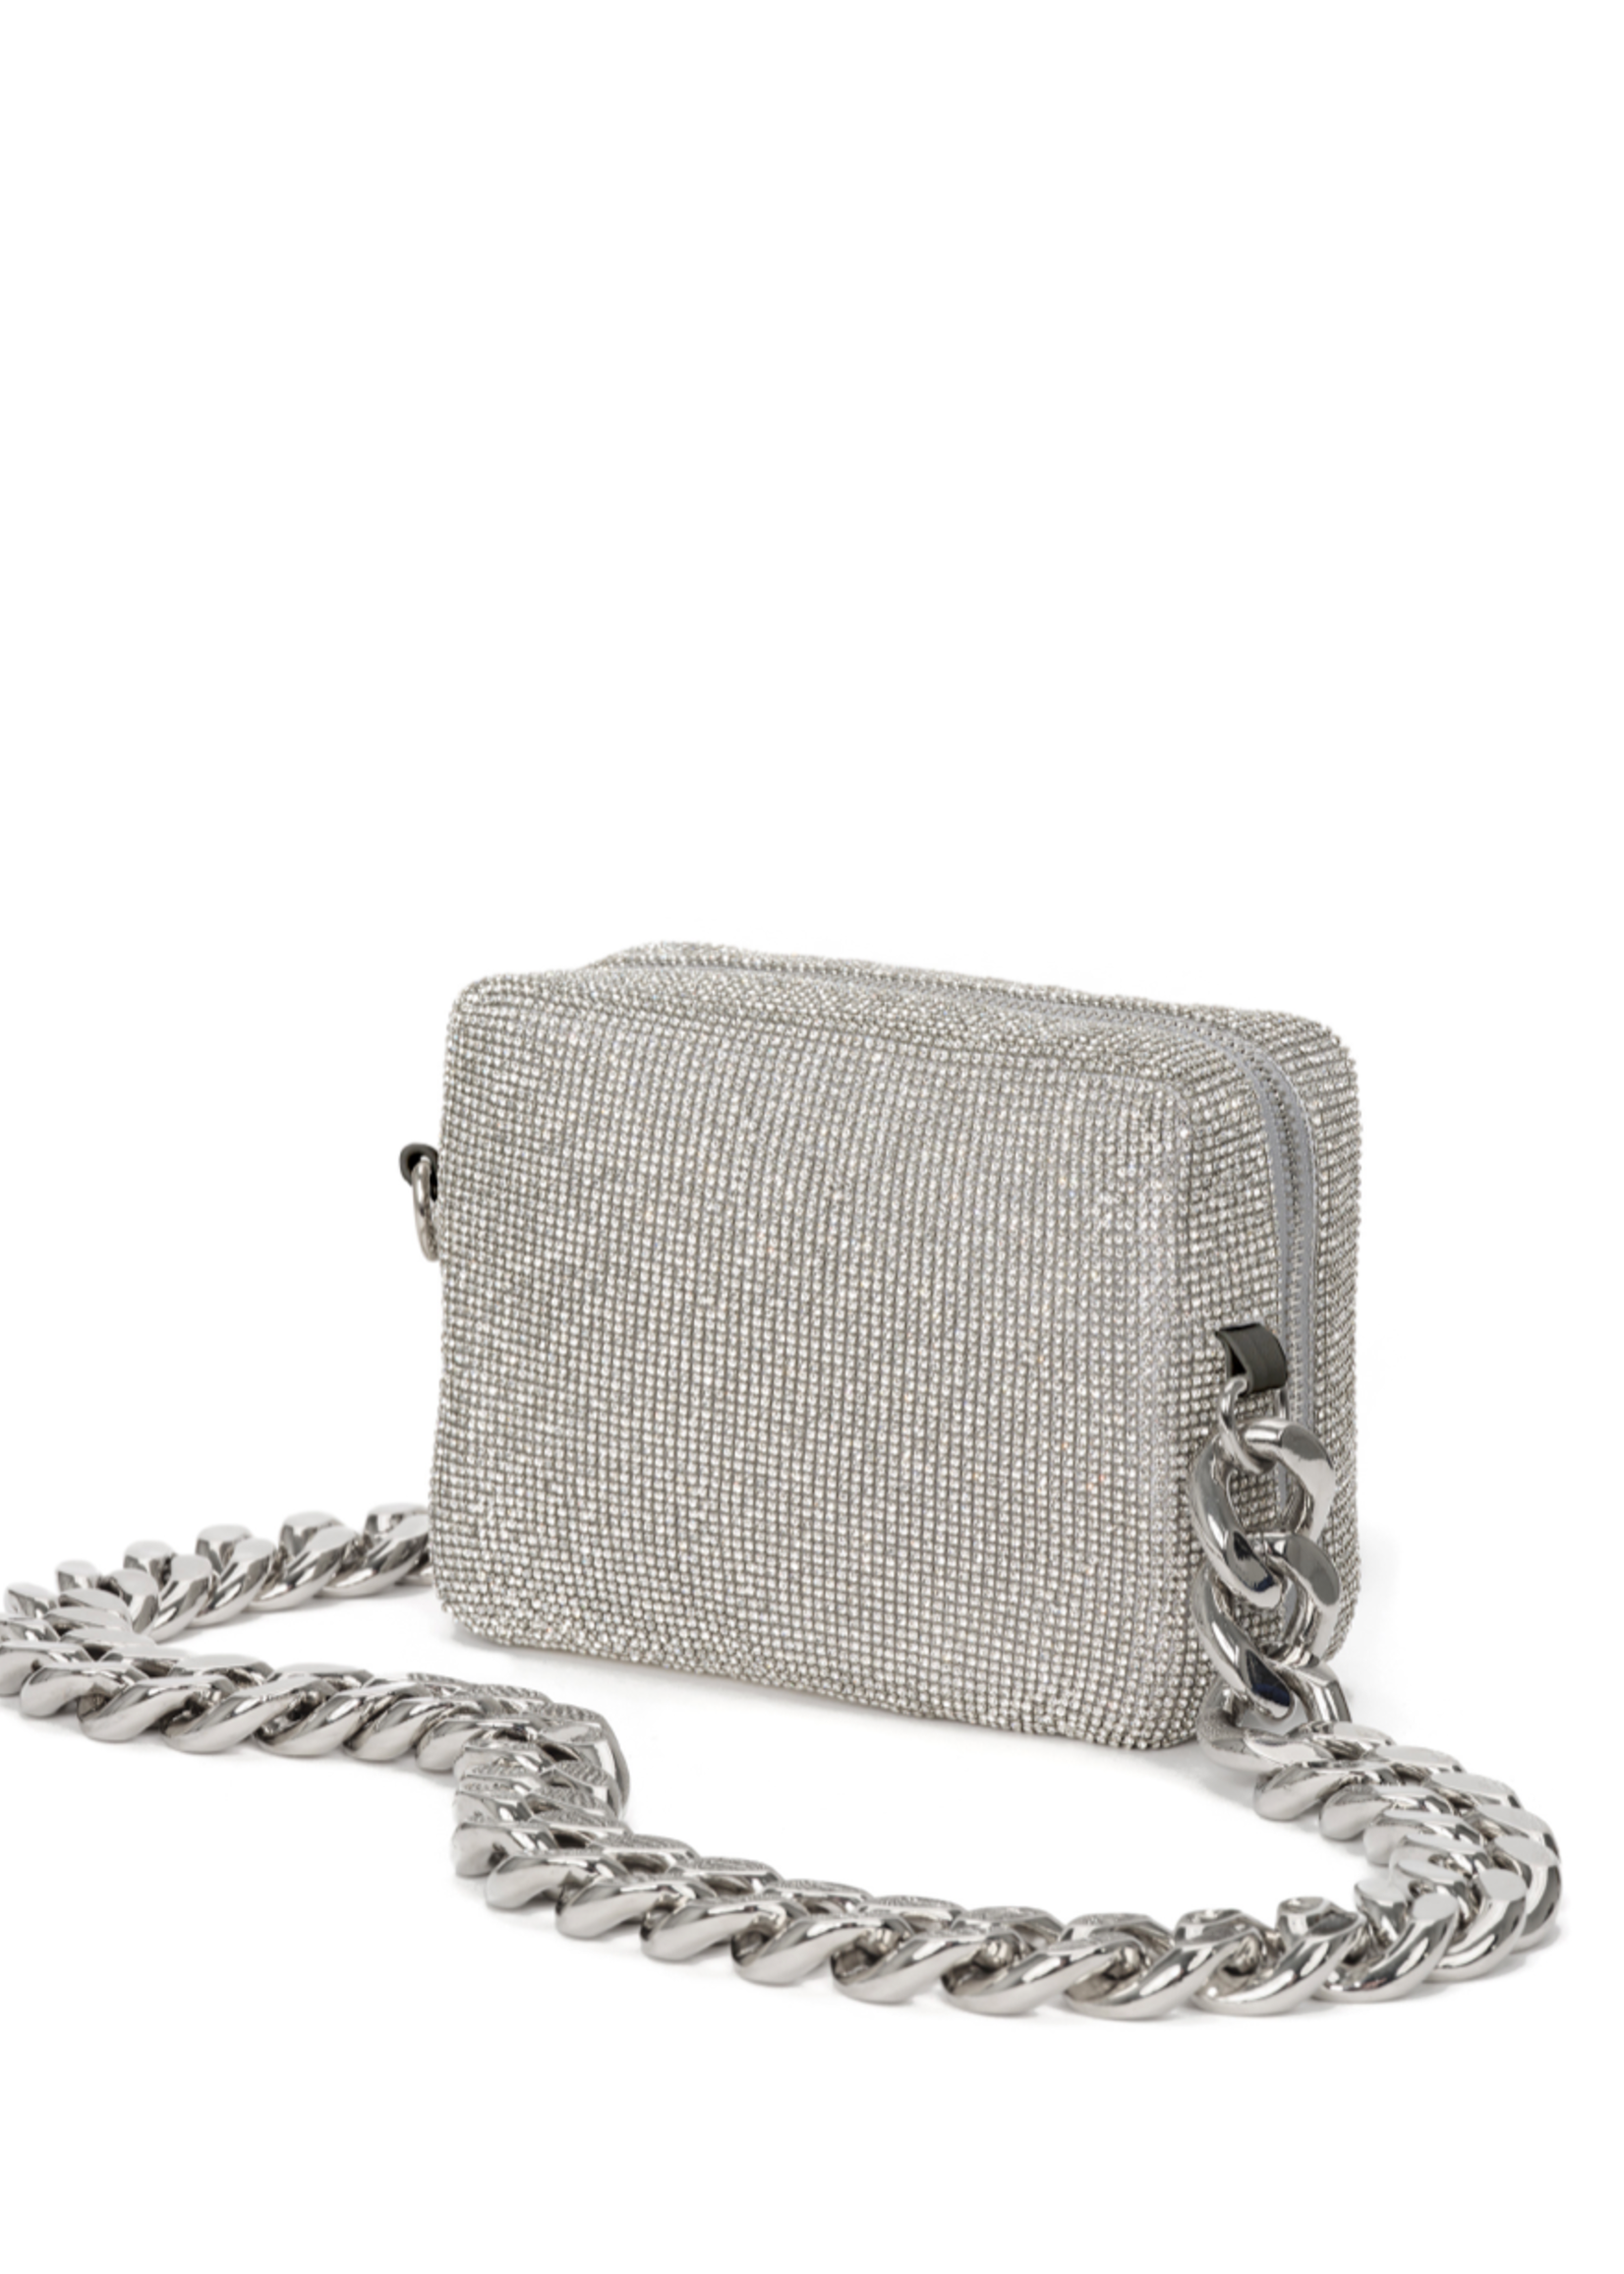 KARA KARA Crystal Mesh Camera Bag White Crystal